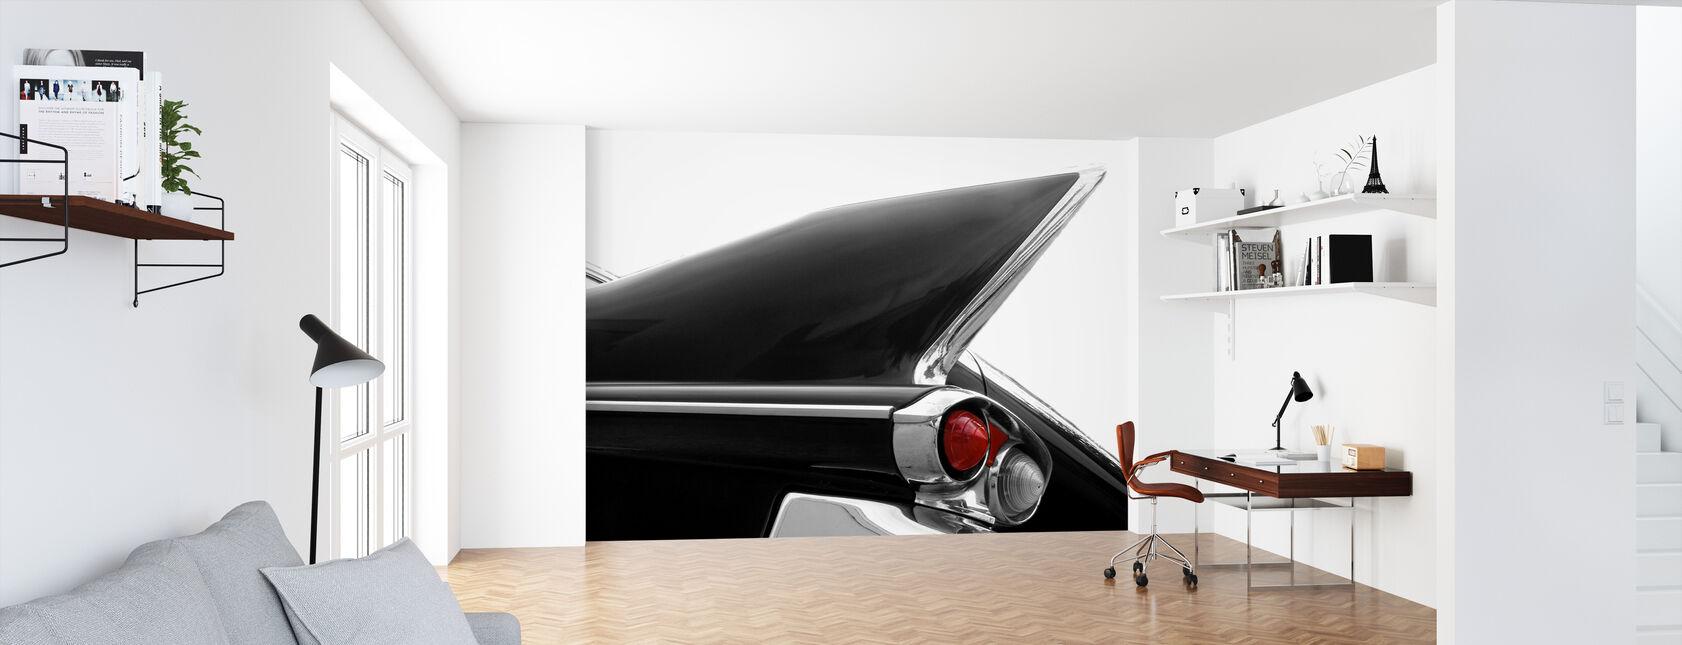 Jet Era - Wallpaper - Office